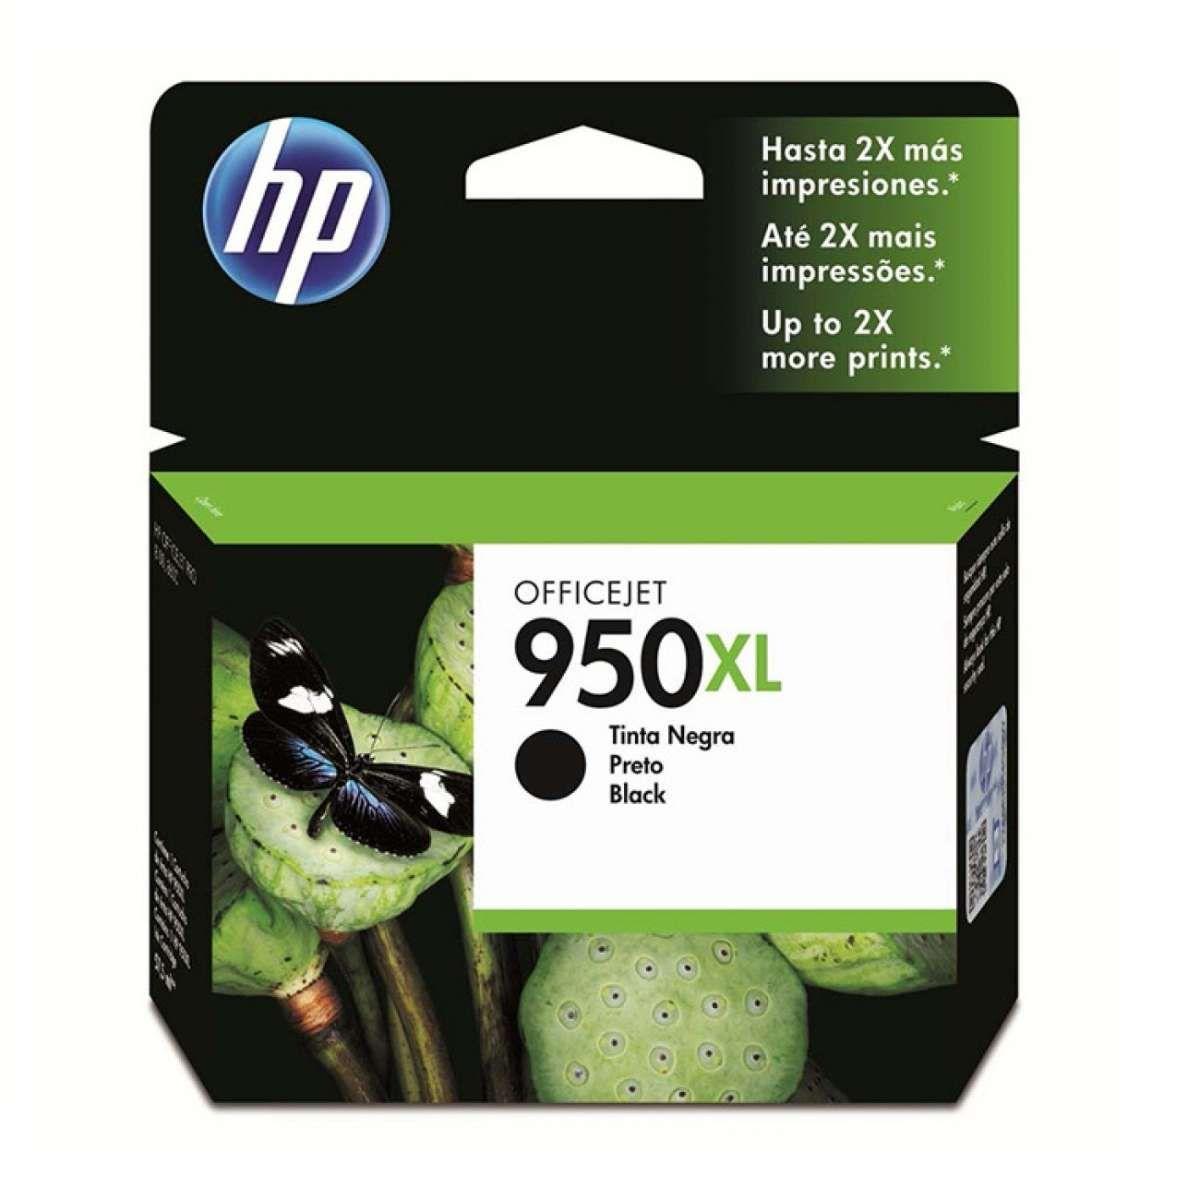 Cartucho de Tinta HP OfficeJet 950XL CN045AB Preto 53 ml